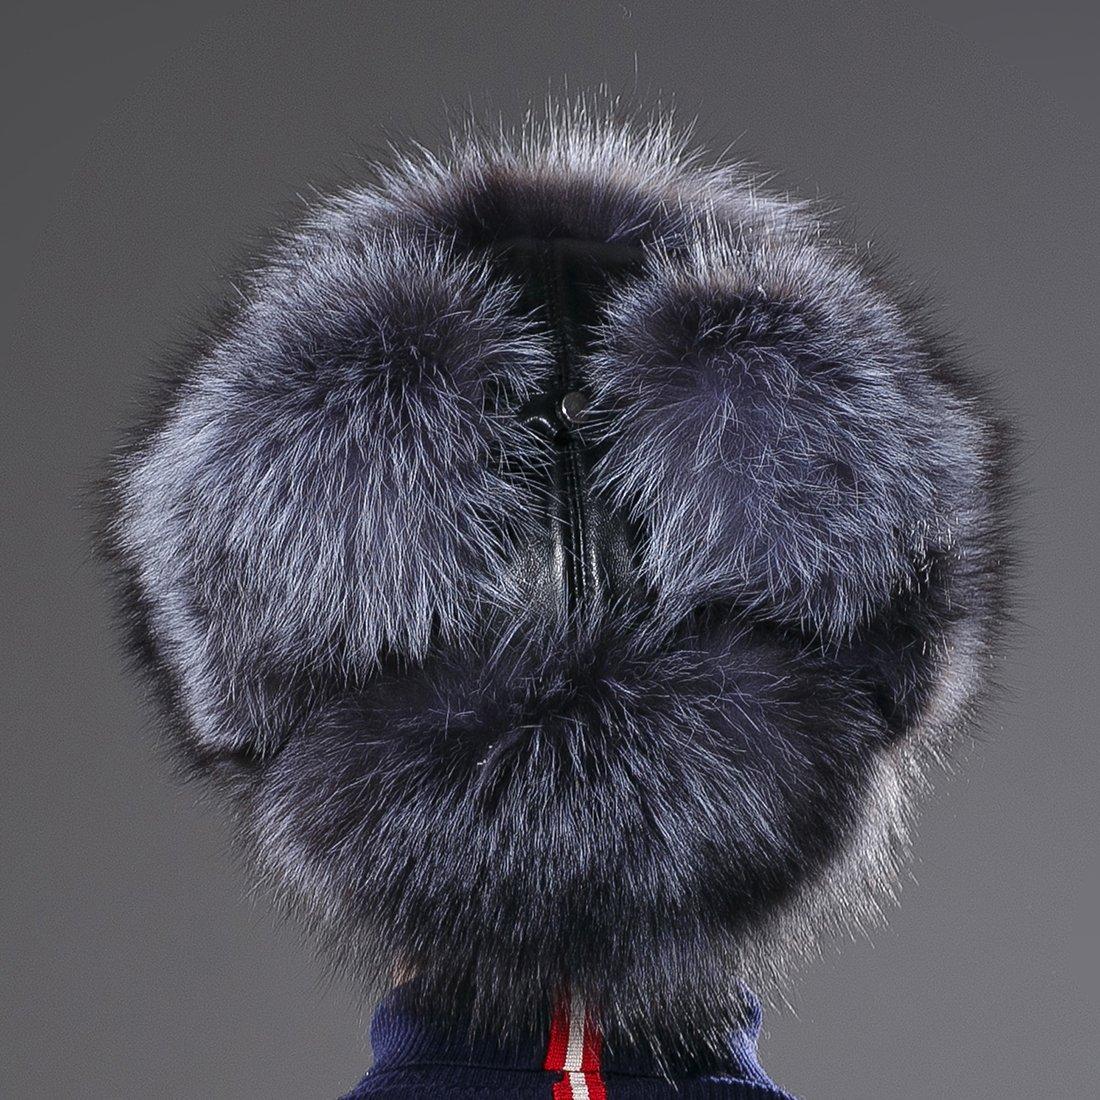 URSFUR Winter Mens Russian Ushanka Hat Real Leather & Silver Fox Fur Trapper Cap by URSFUR (Image #5)